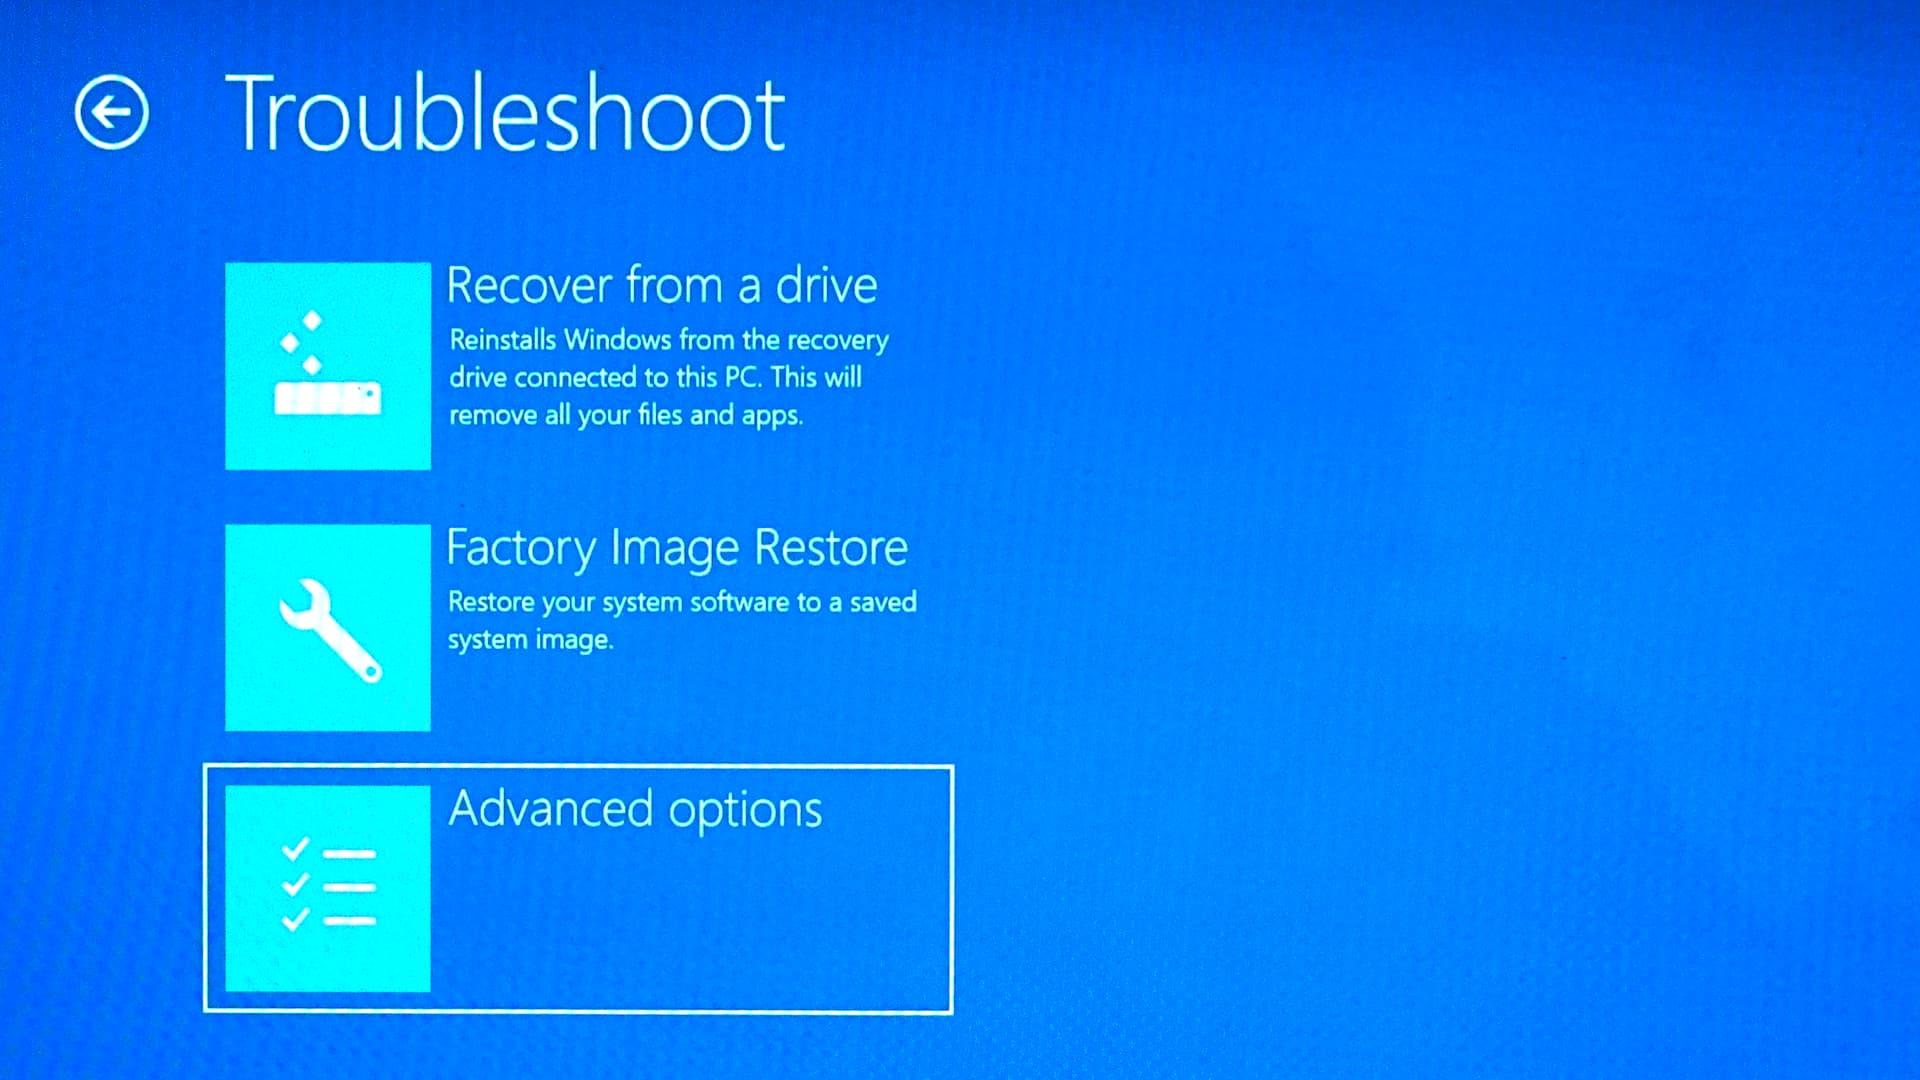 Windows 10 choose advanced options